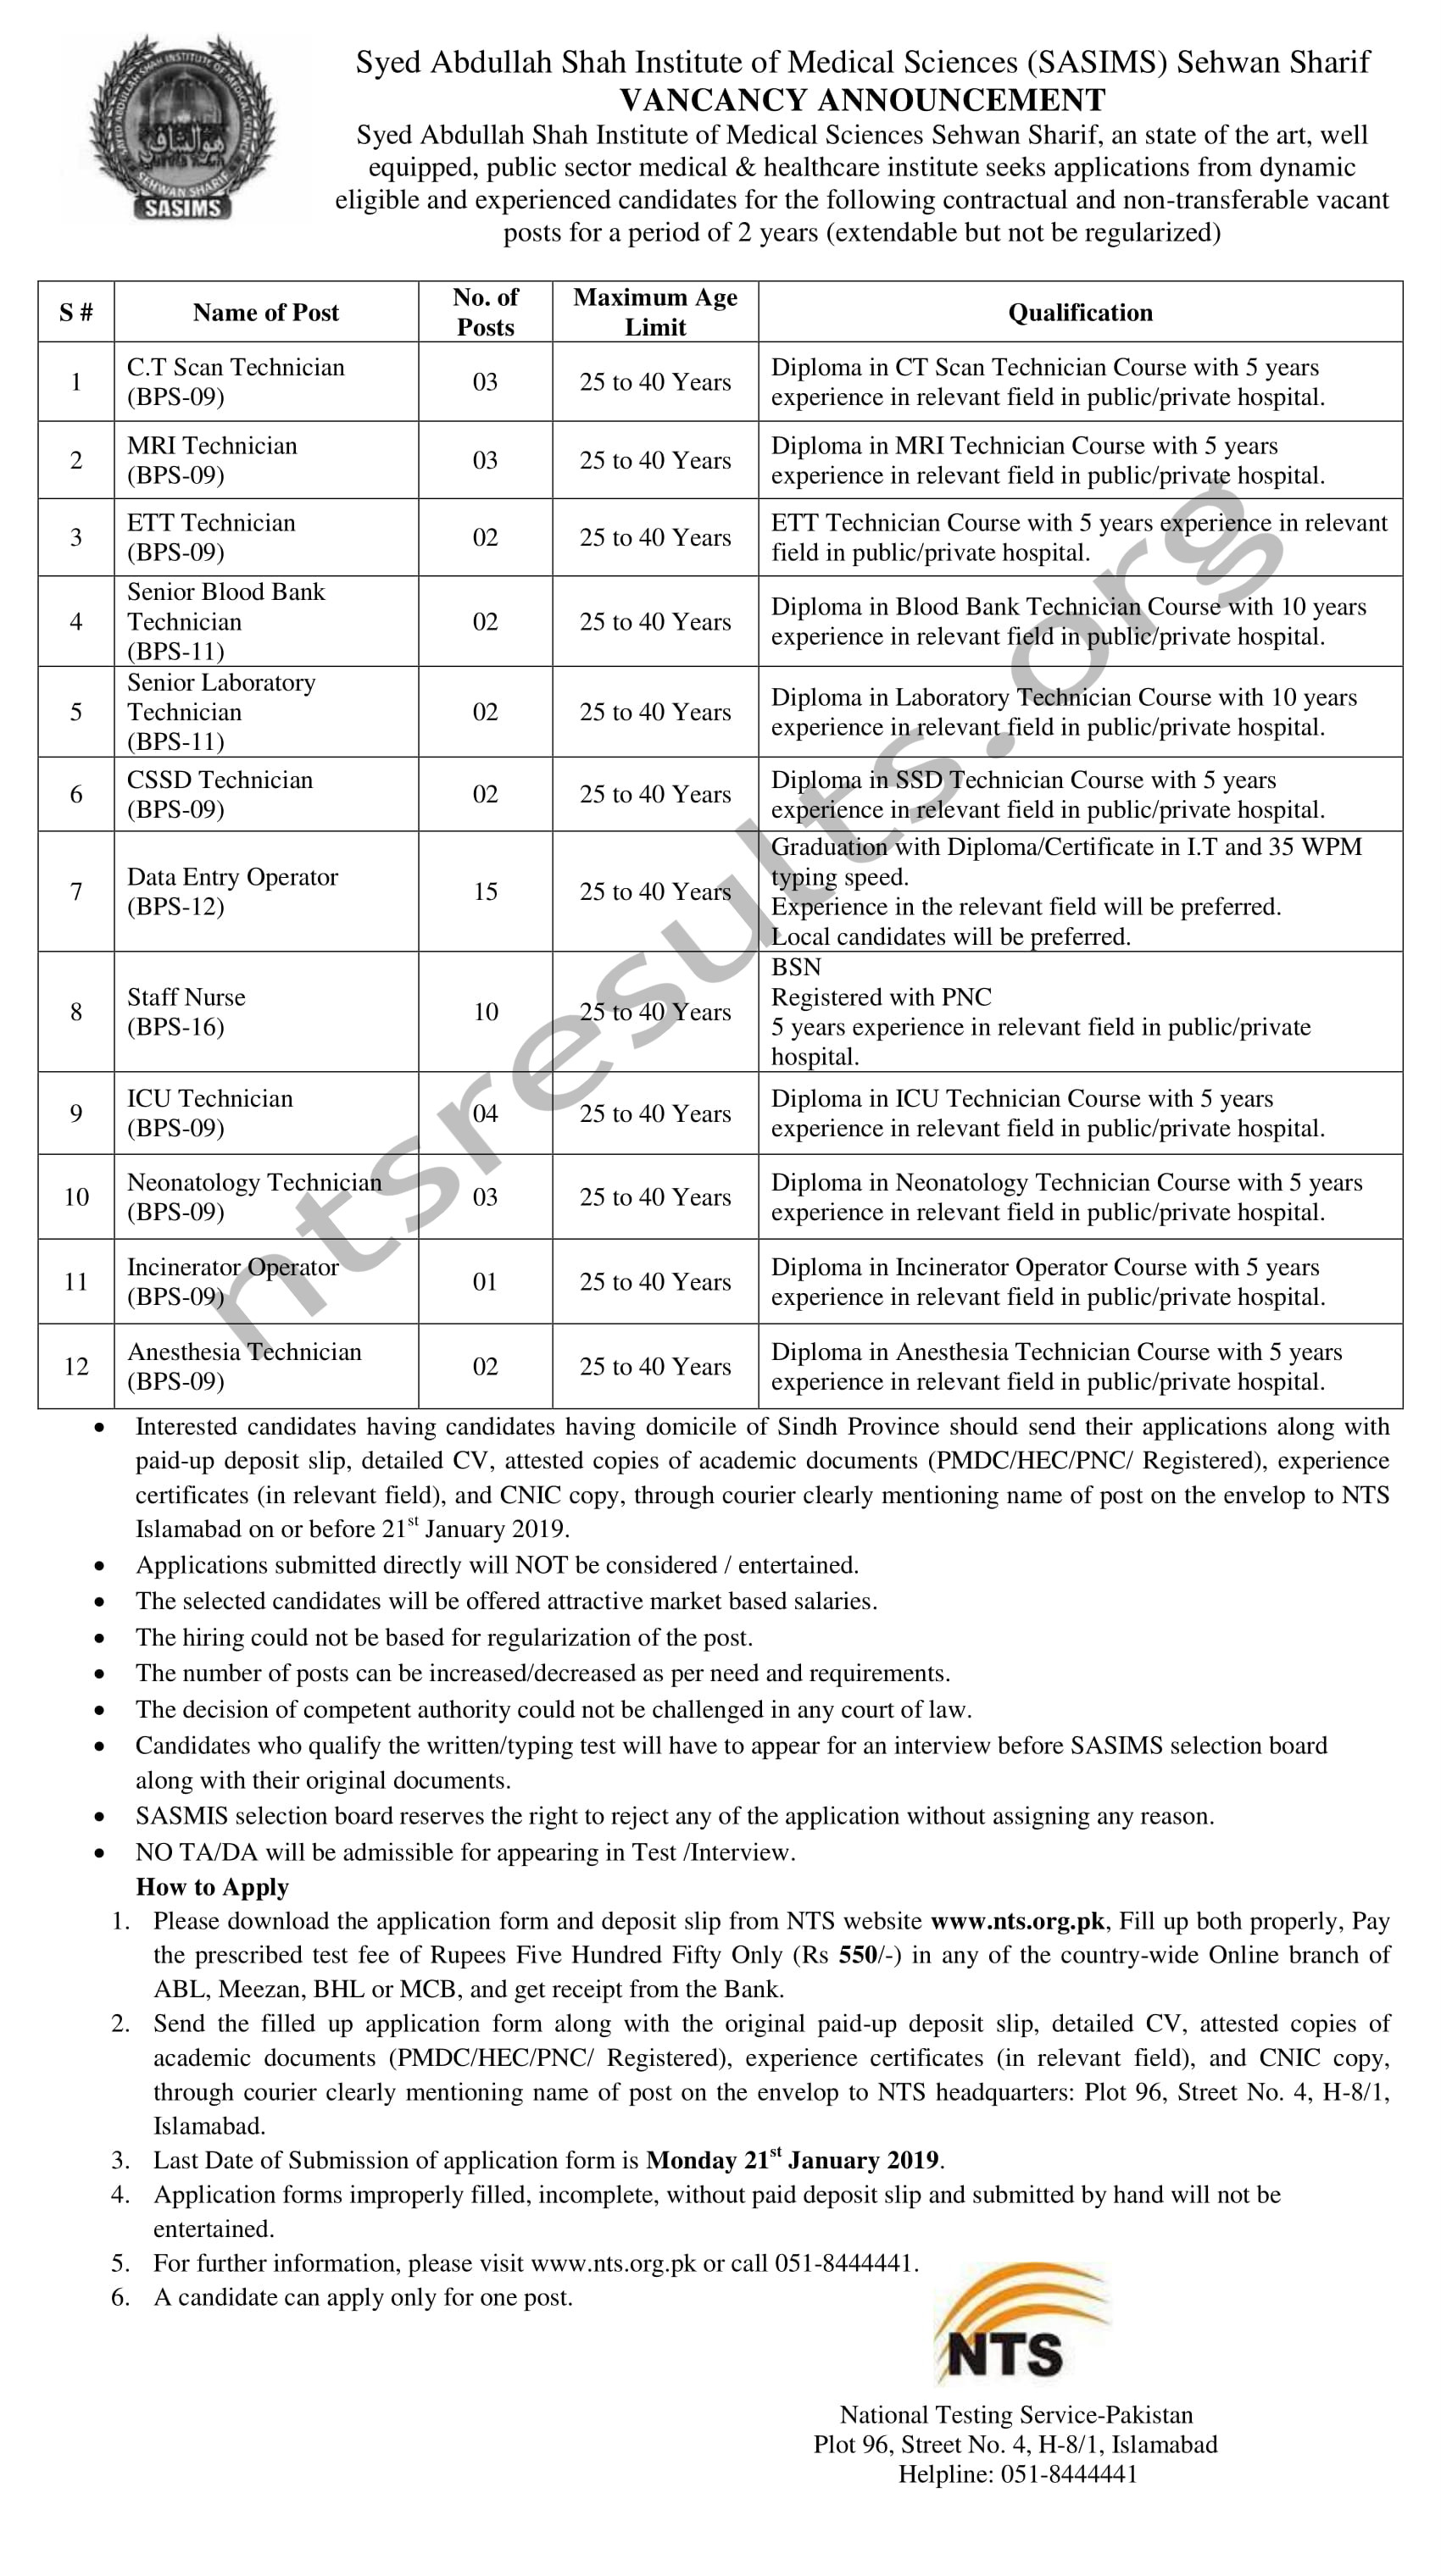 Syed Abdullah Shah Institute of Medical Sciences SASIMS Sehwan Sharif Jobs Via NTS